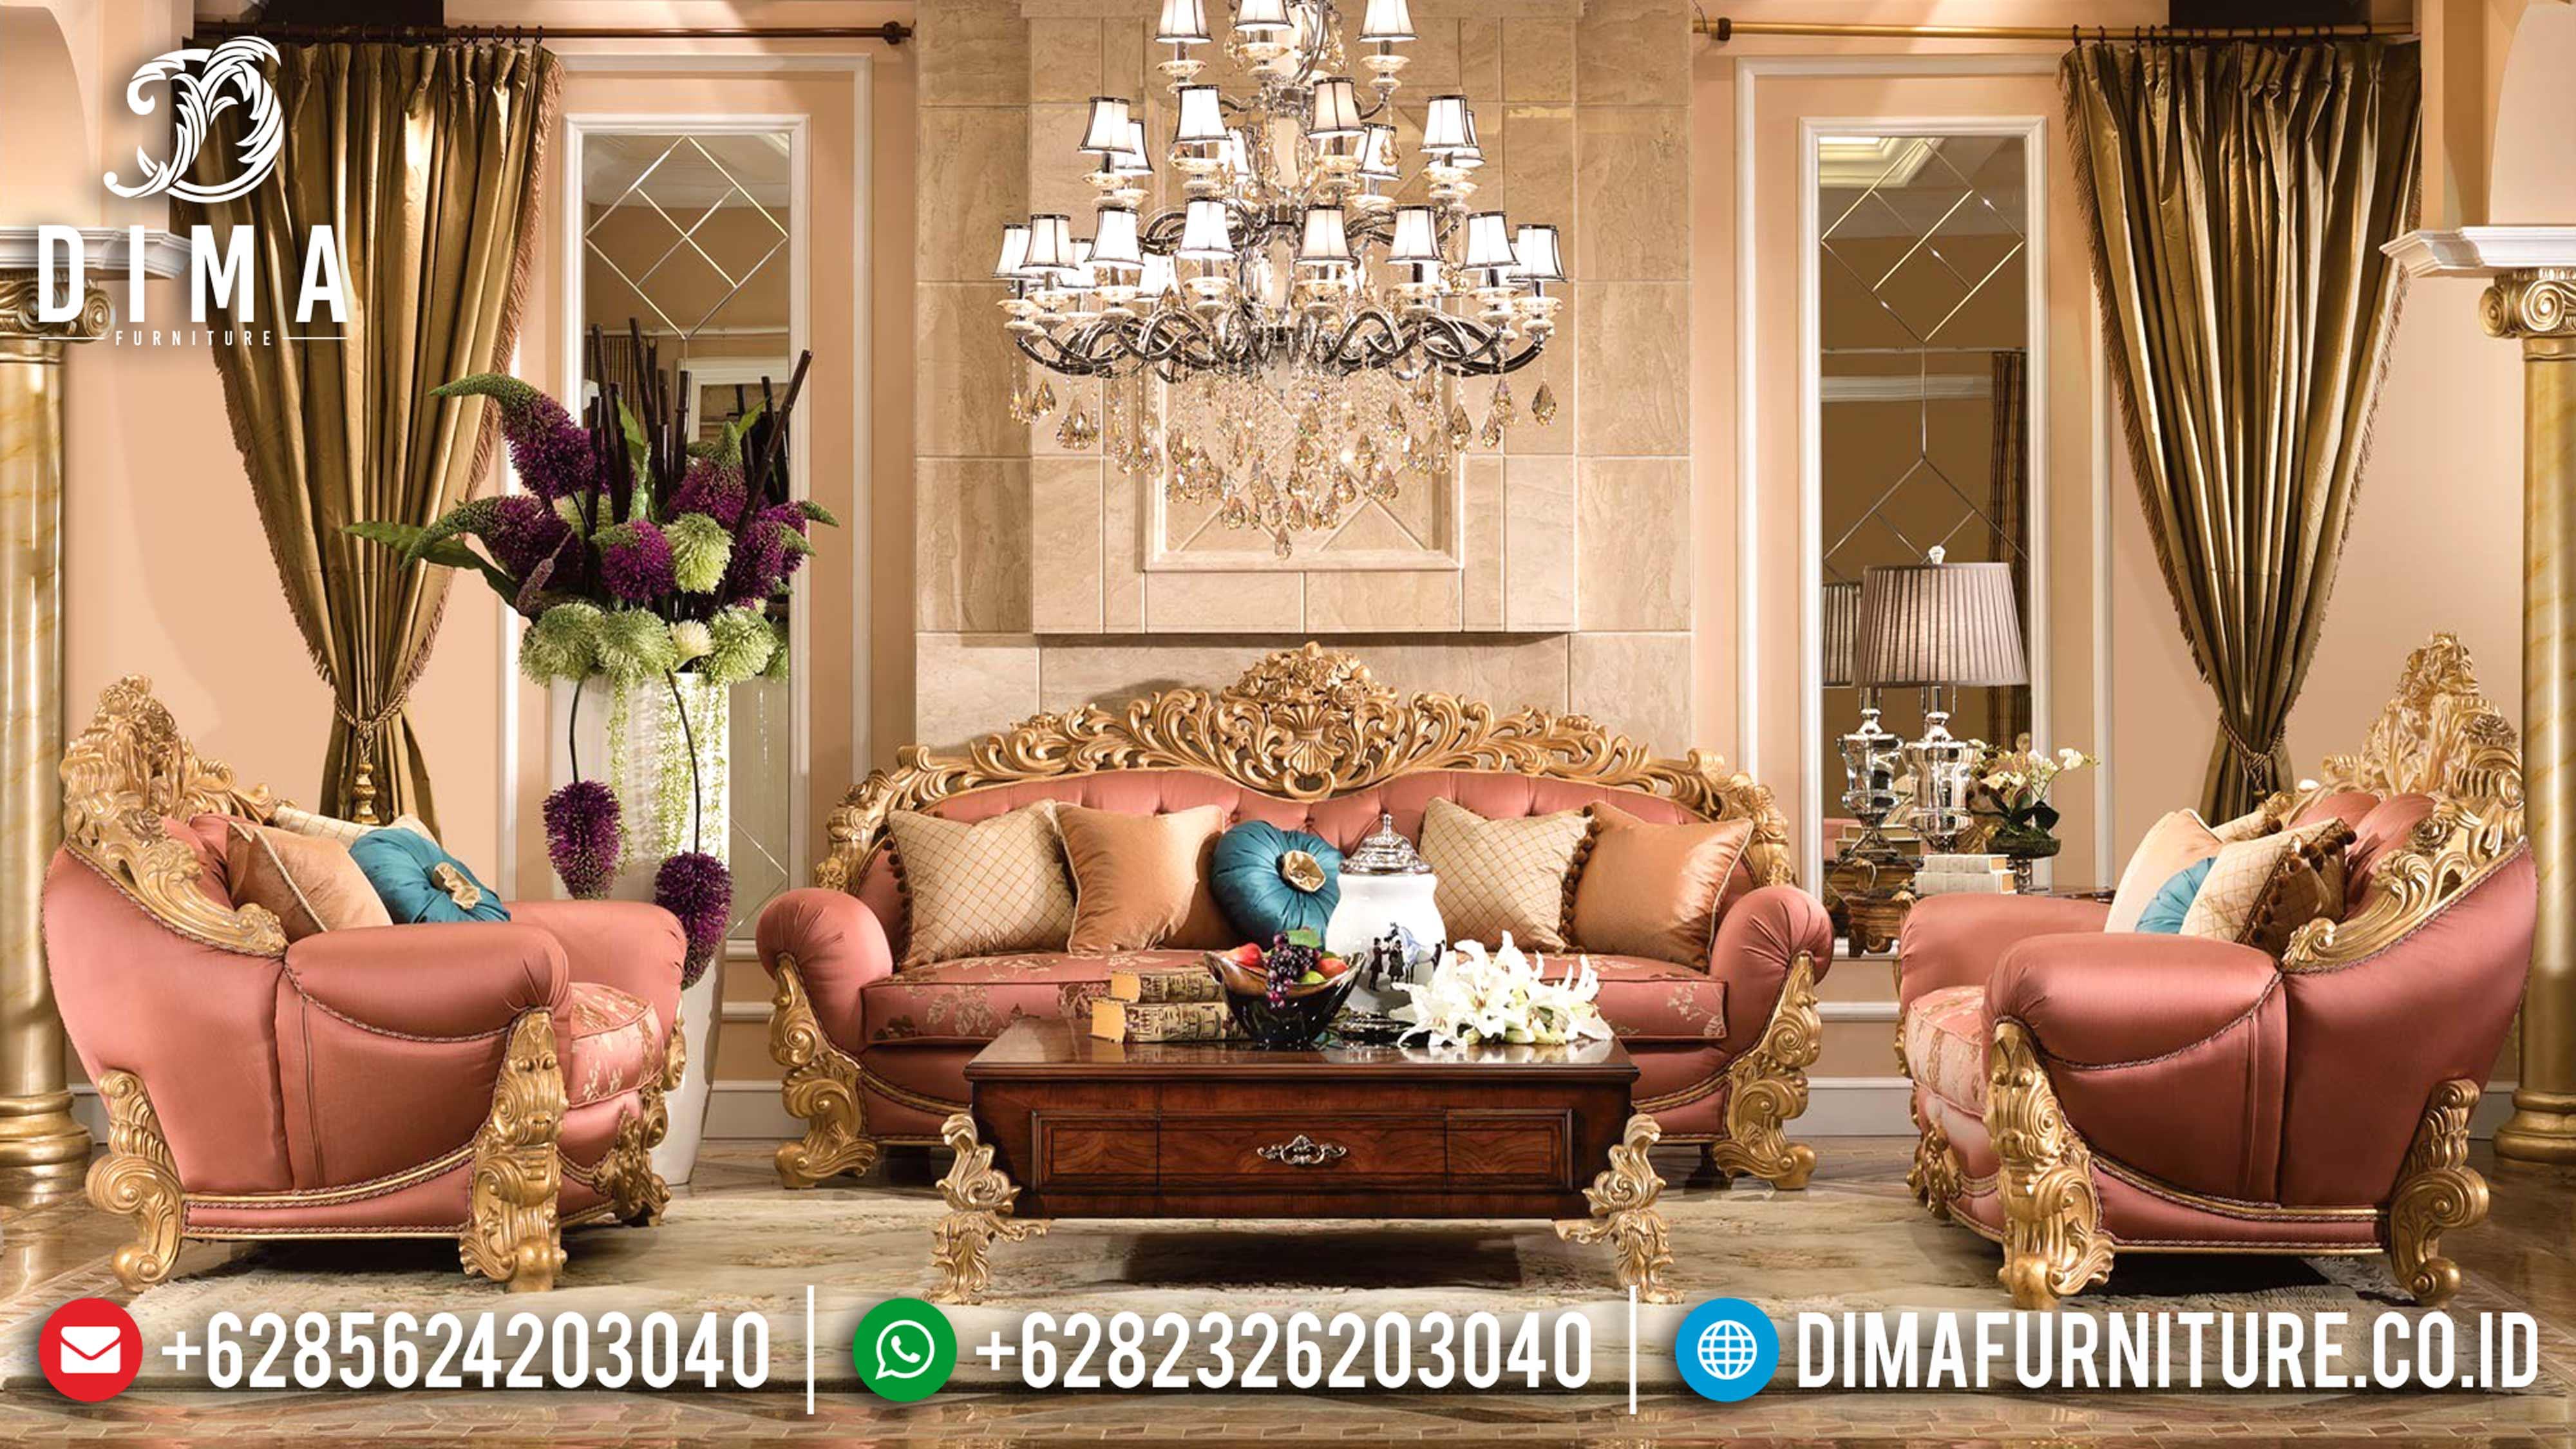 Waldorf Classic Furniture Set Sofa Tamu Jepara Mewah Ukiran Jepara DF-0582